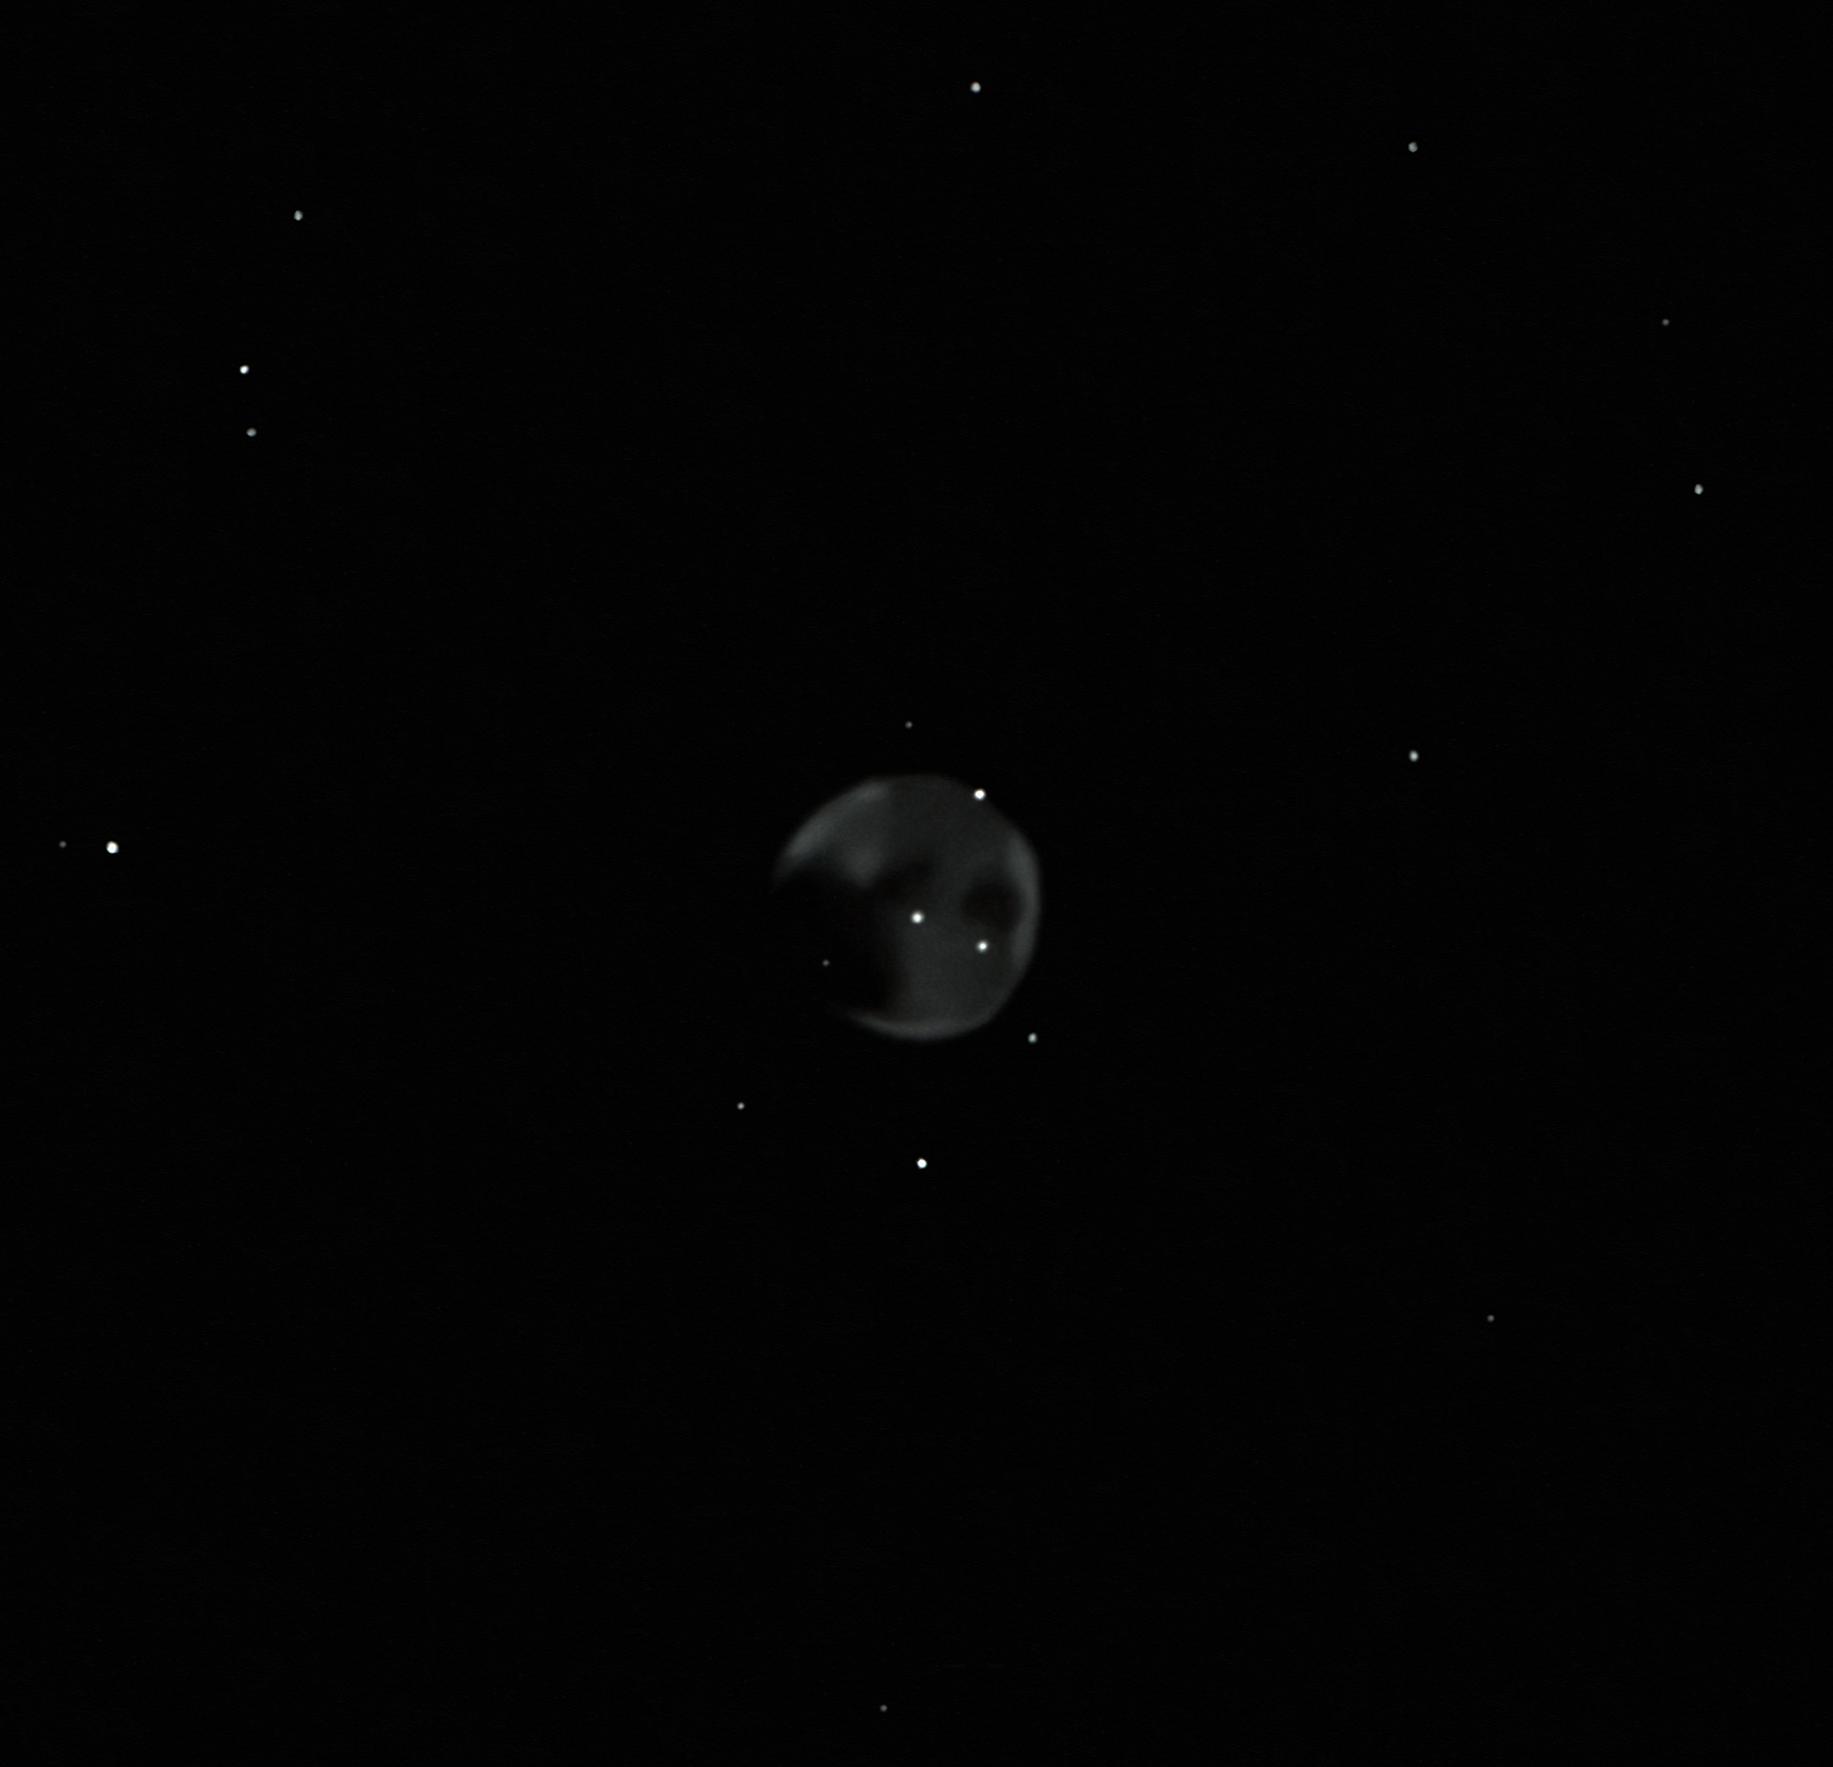 ngc 246 planetary nebula